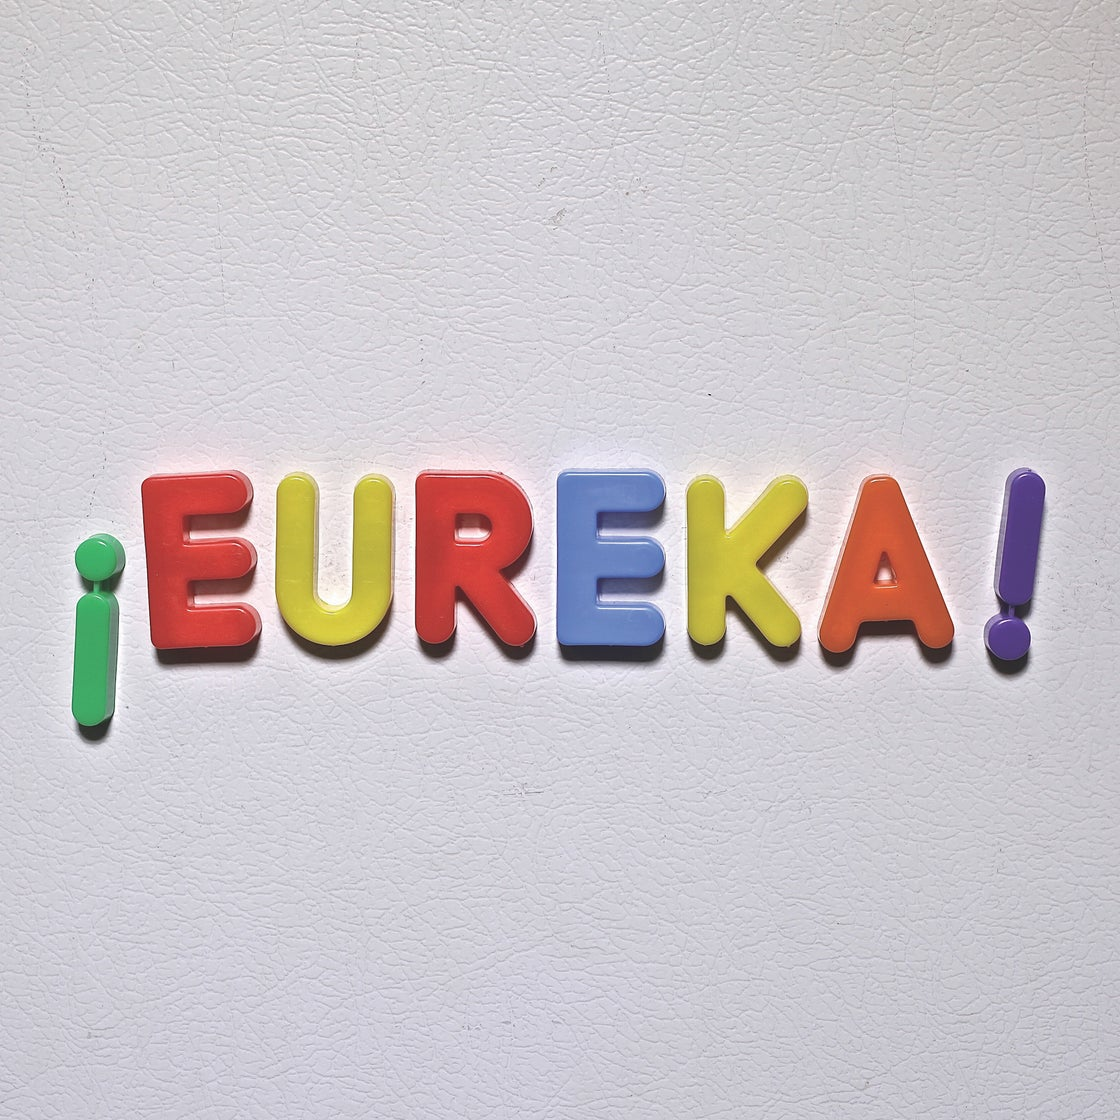 Image of ¡EUREKA! - Eureka The Butcher